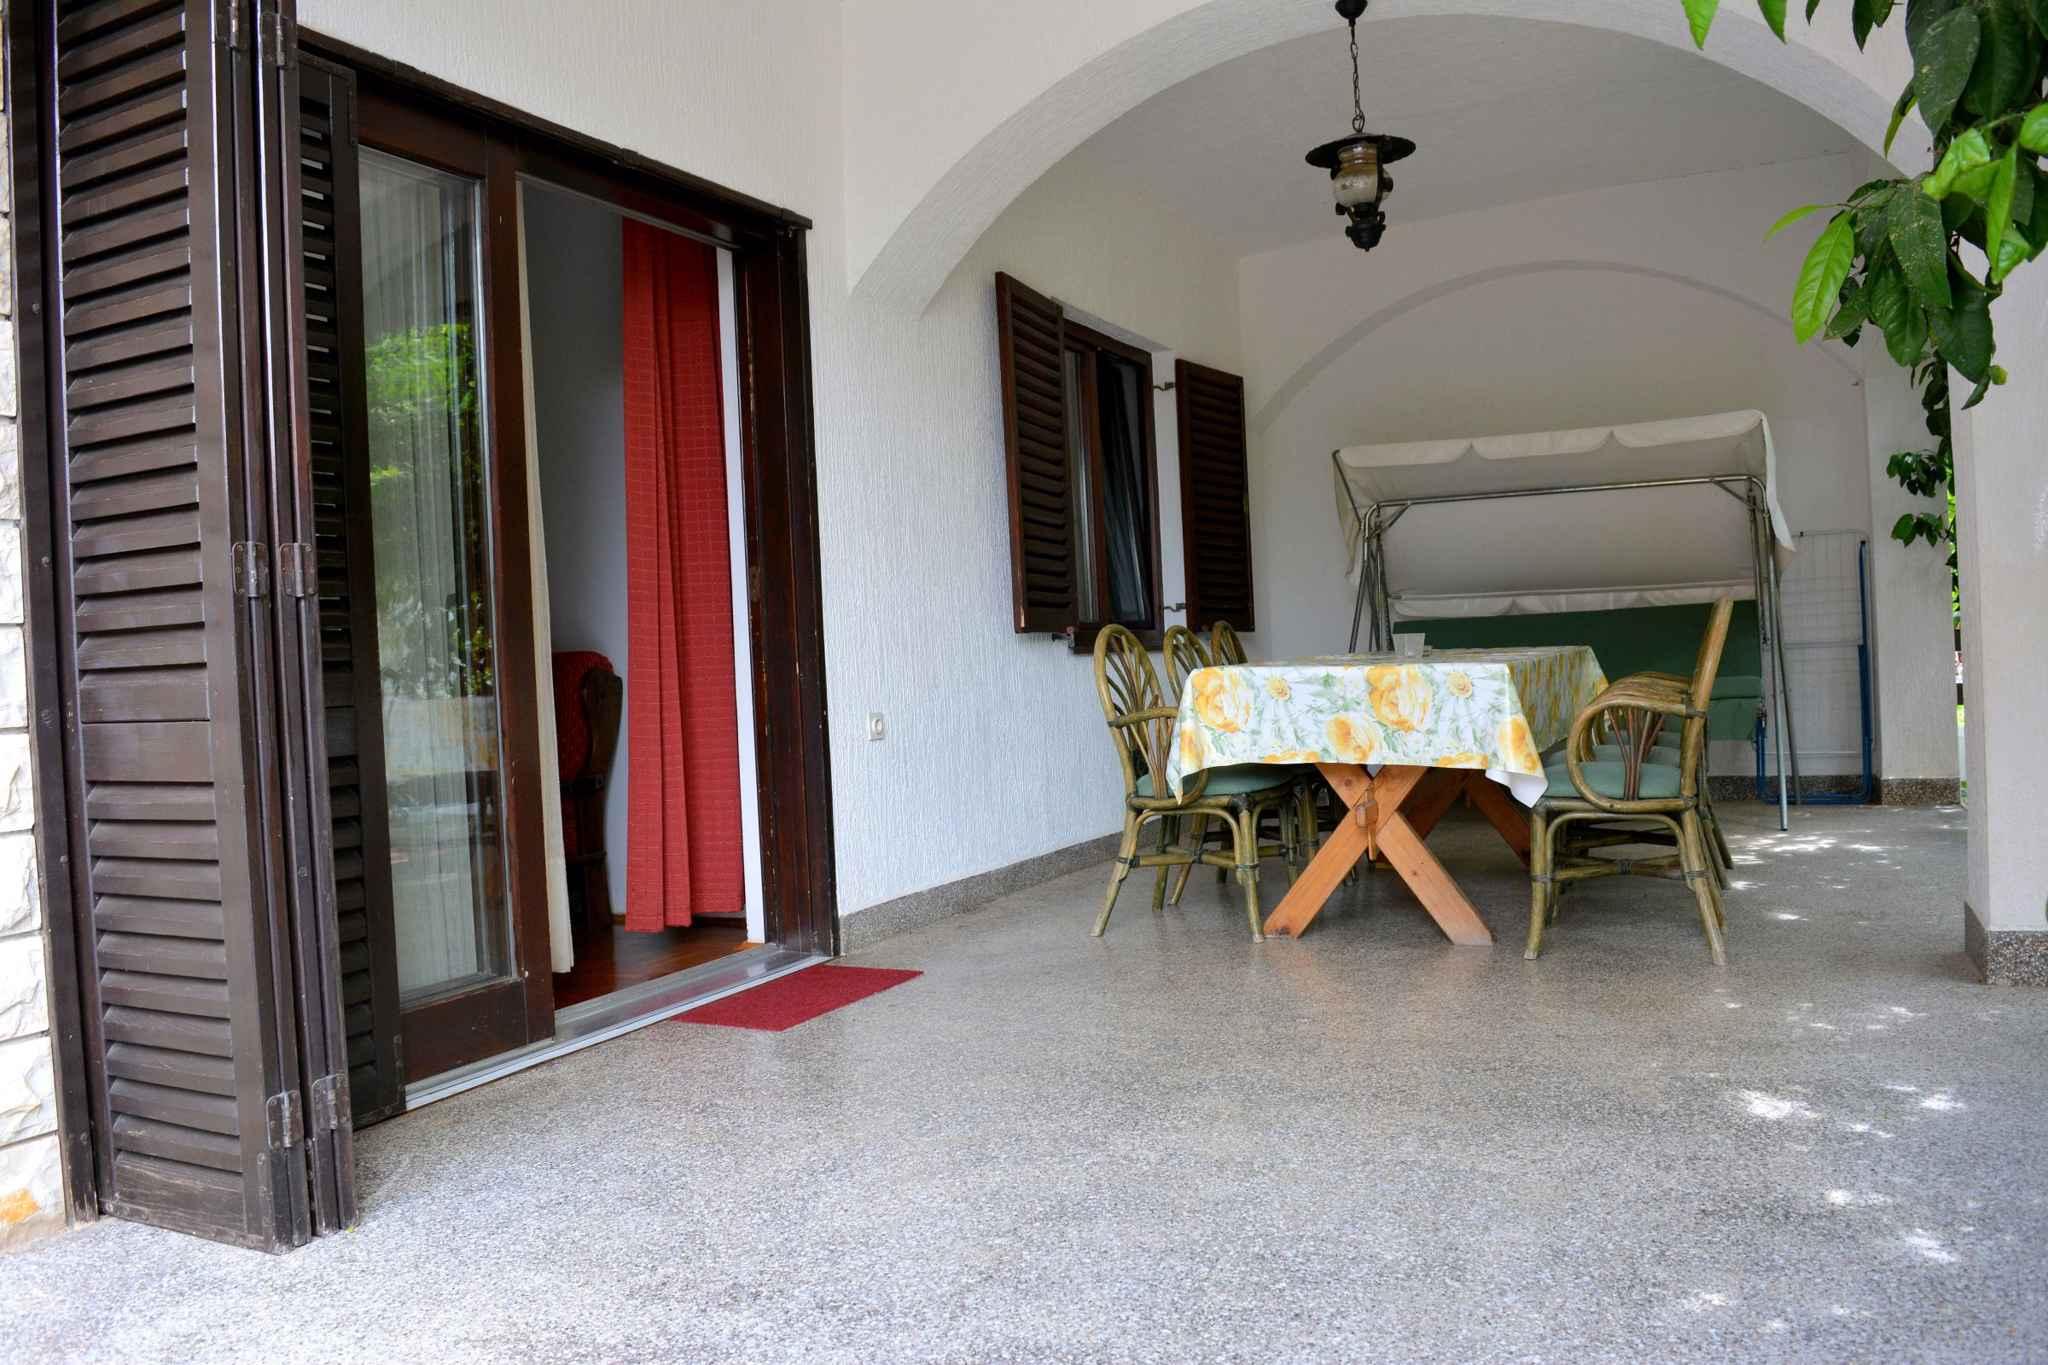 Appartement de vacances mit Terrasse (278776), Vodice, , Dalmatie, Croatie, image 8